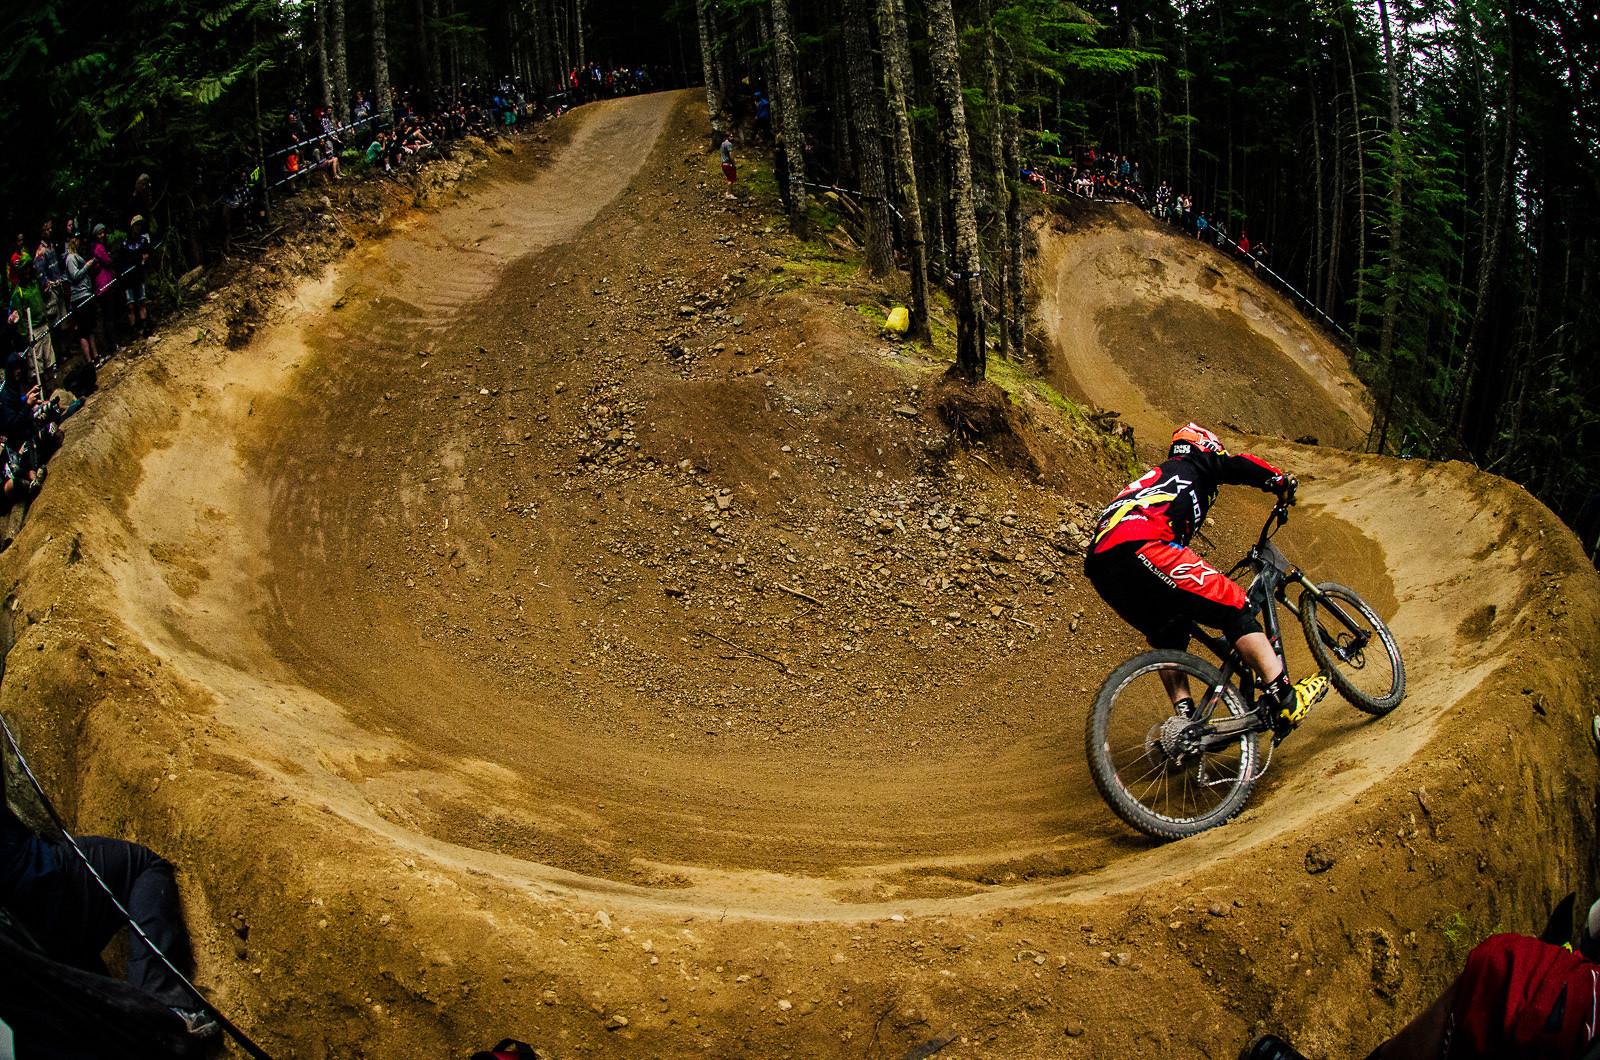 2014 Crankworx FOX Air DH - Berms, Berms, Berms - iceman2058 - Mountain Biking Pictures - Vital MTB